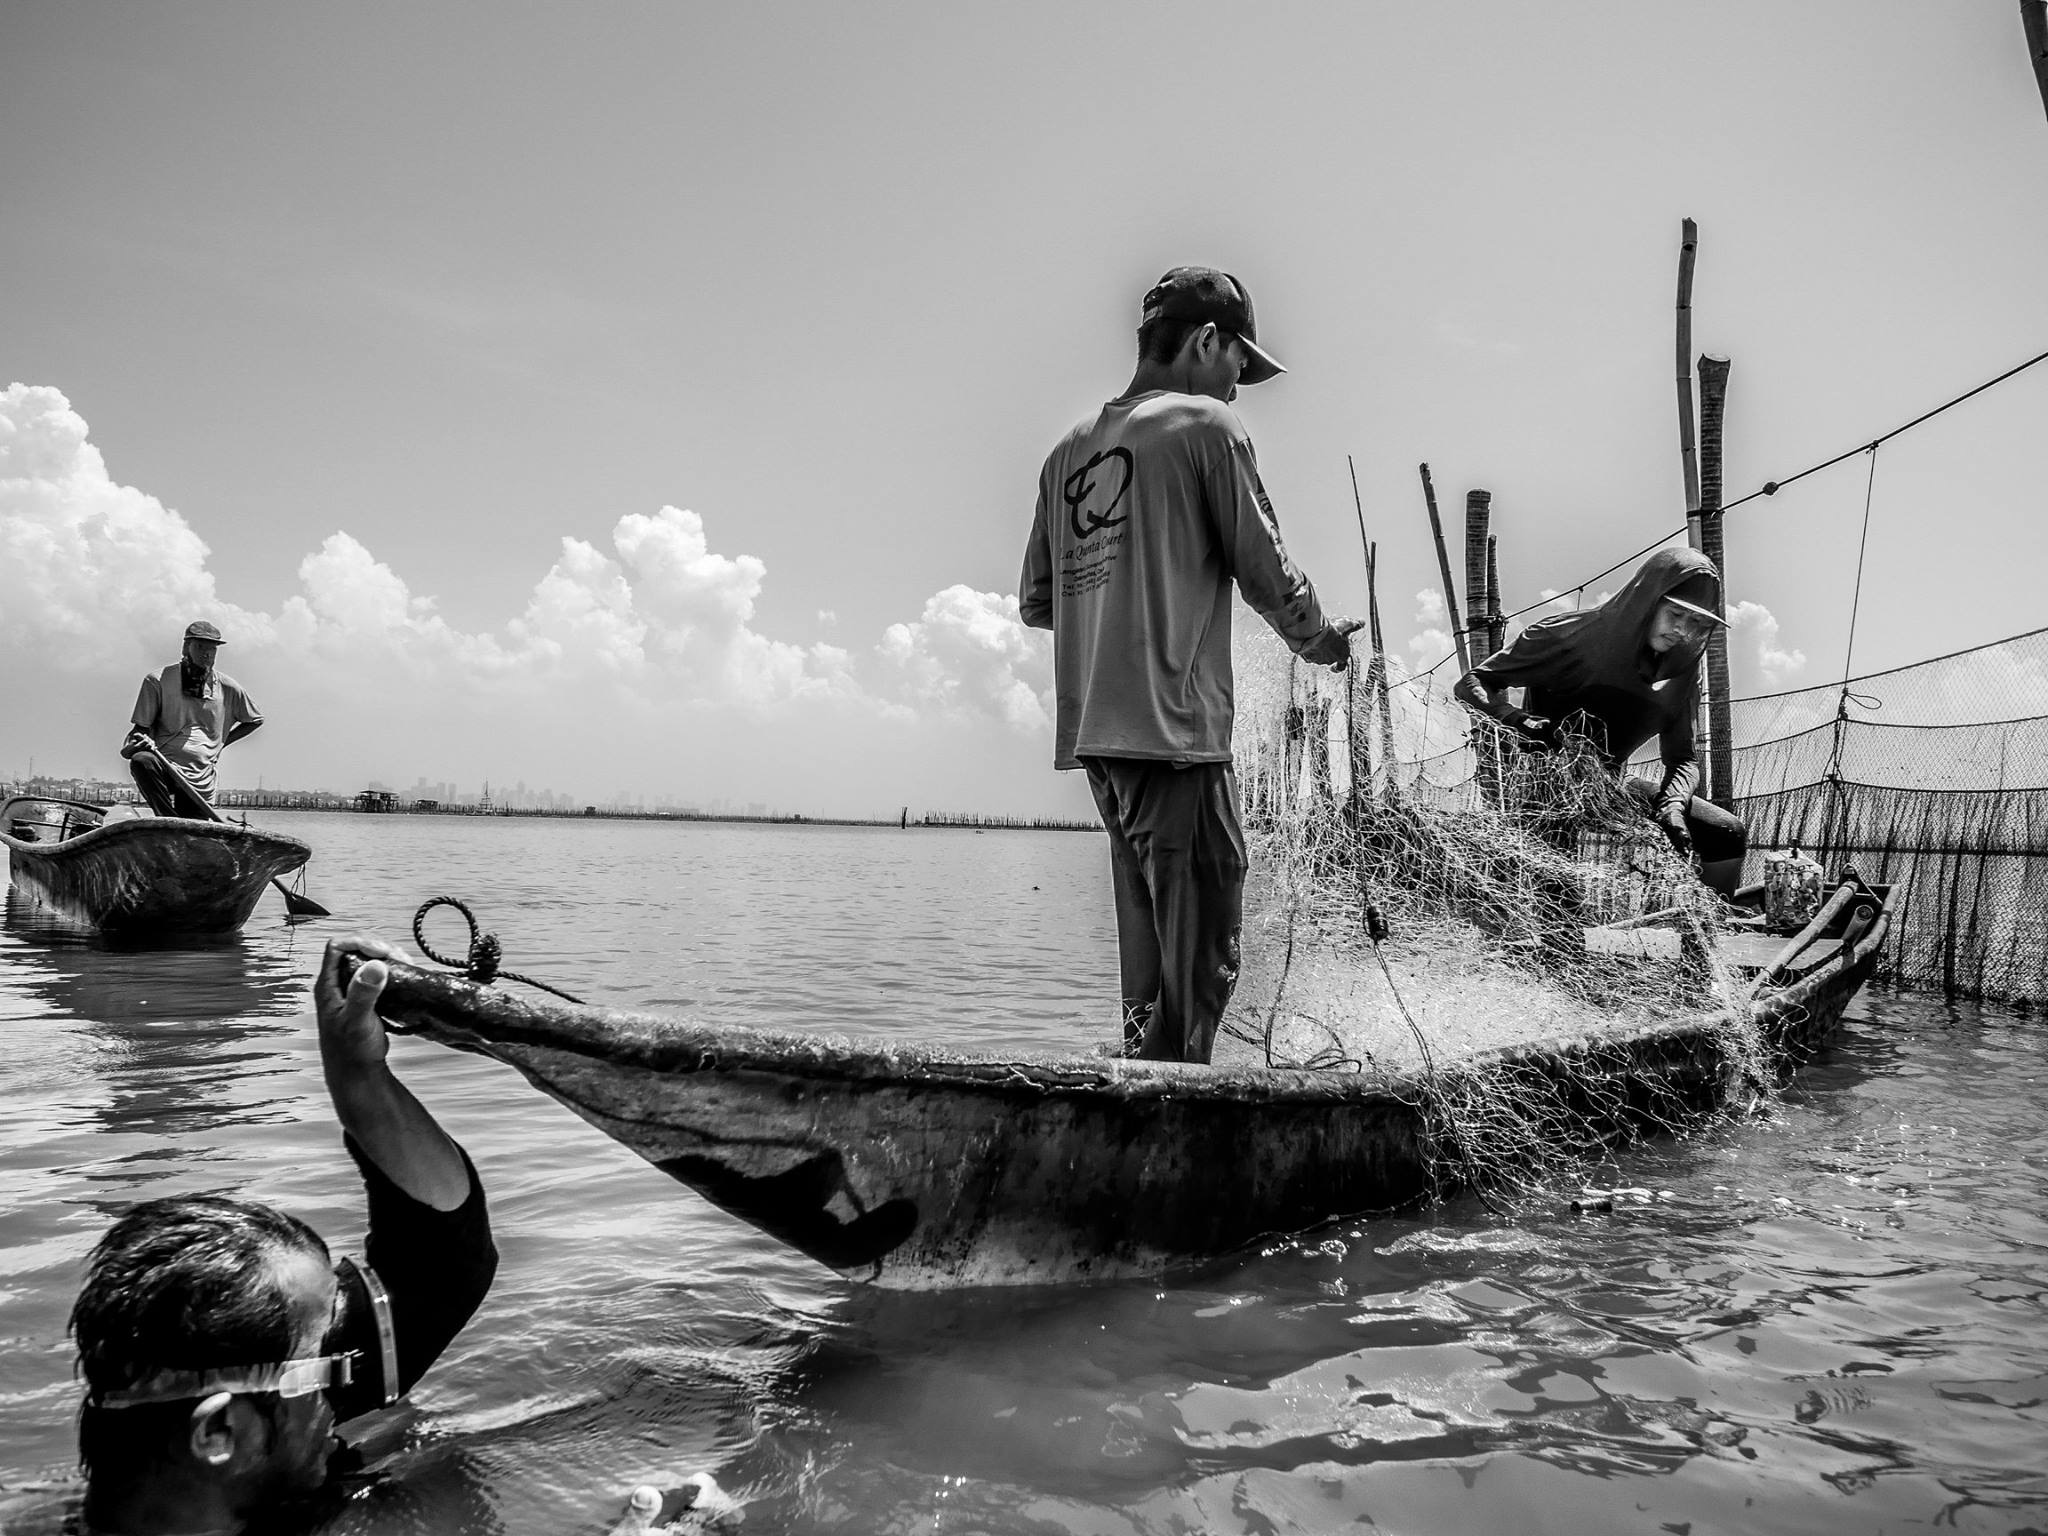 Fishermen harvesting in Laguna Lake. (Photo by Dex Aserdano)